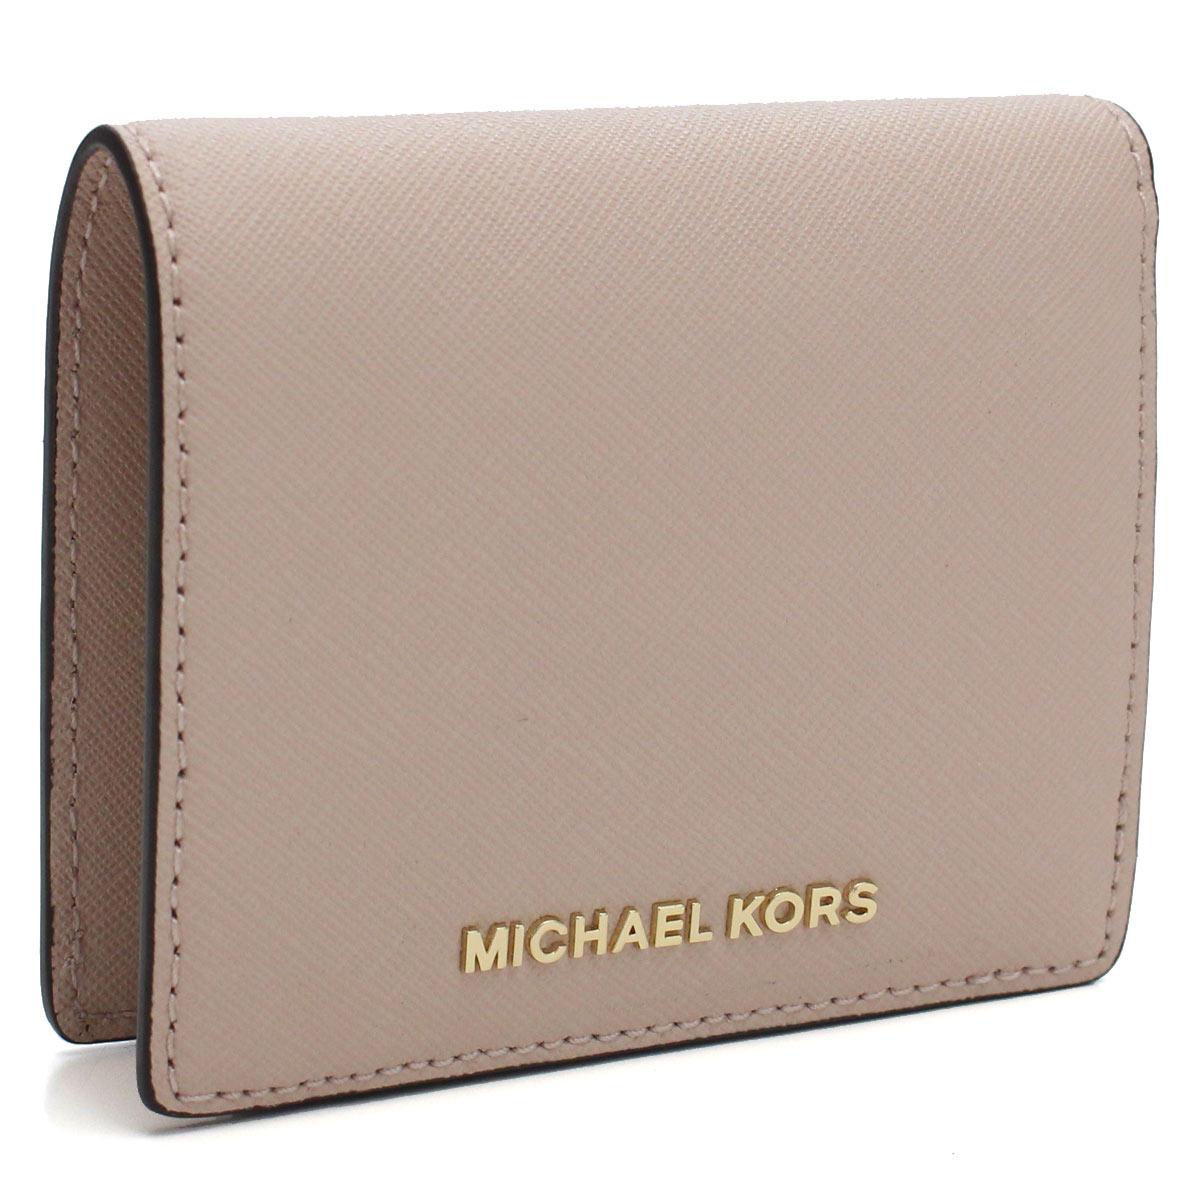 c7f7e21b0c16 Bighit The total brand wholesale: Michael Kors MICHAEL KORS MONEY PIECES  card case 32T4GTVF2L SOFT PINK pink system | Rakuten Global Market